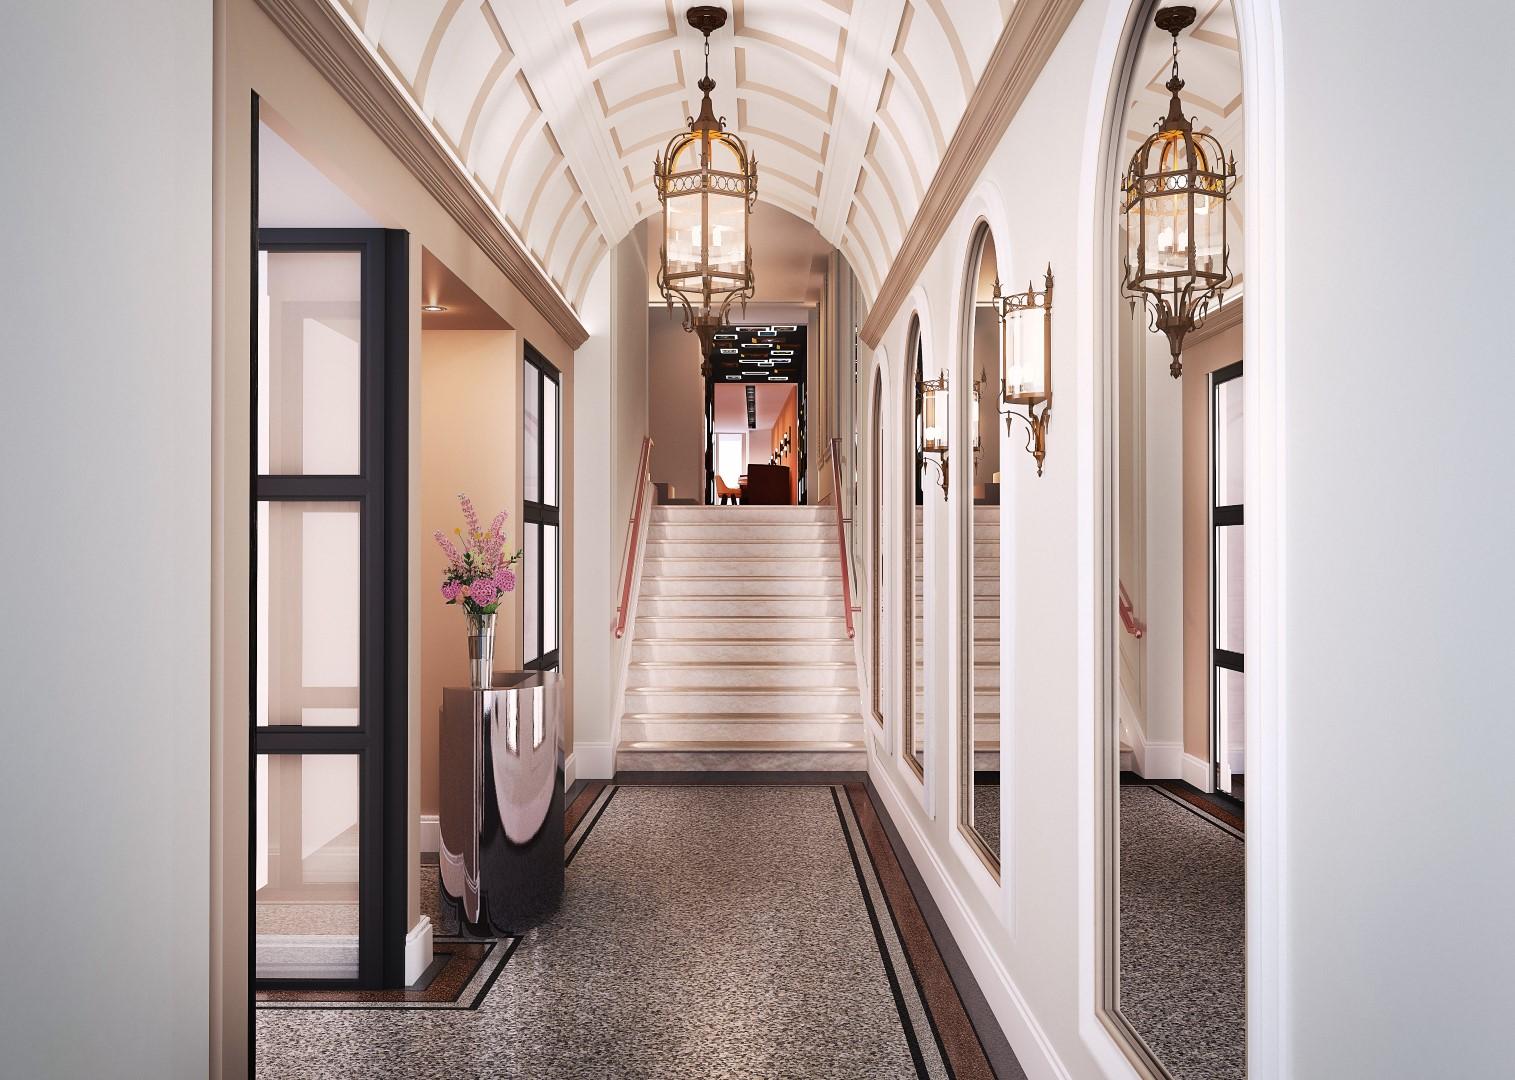 Eingangsbereich, Sir Nikolai Hotel, Hamburg